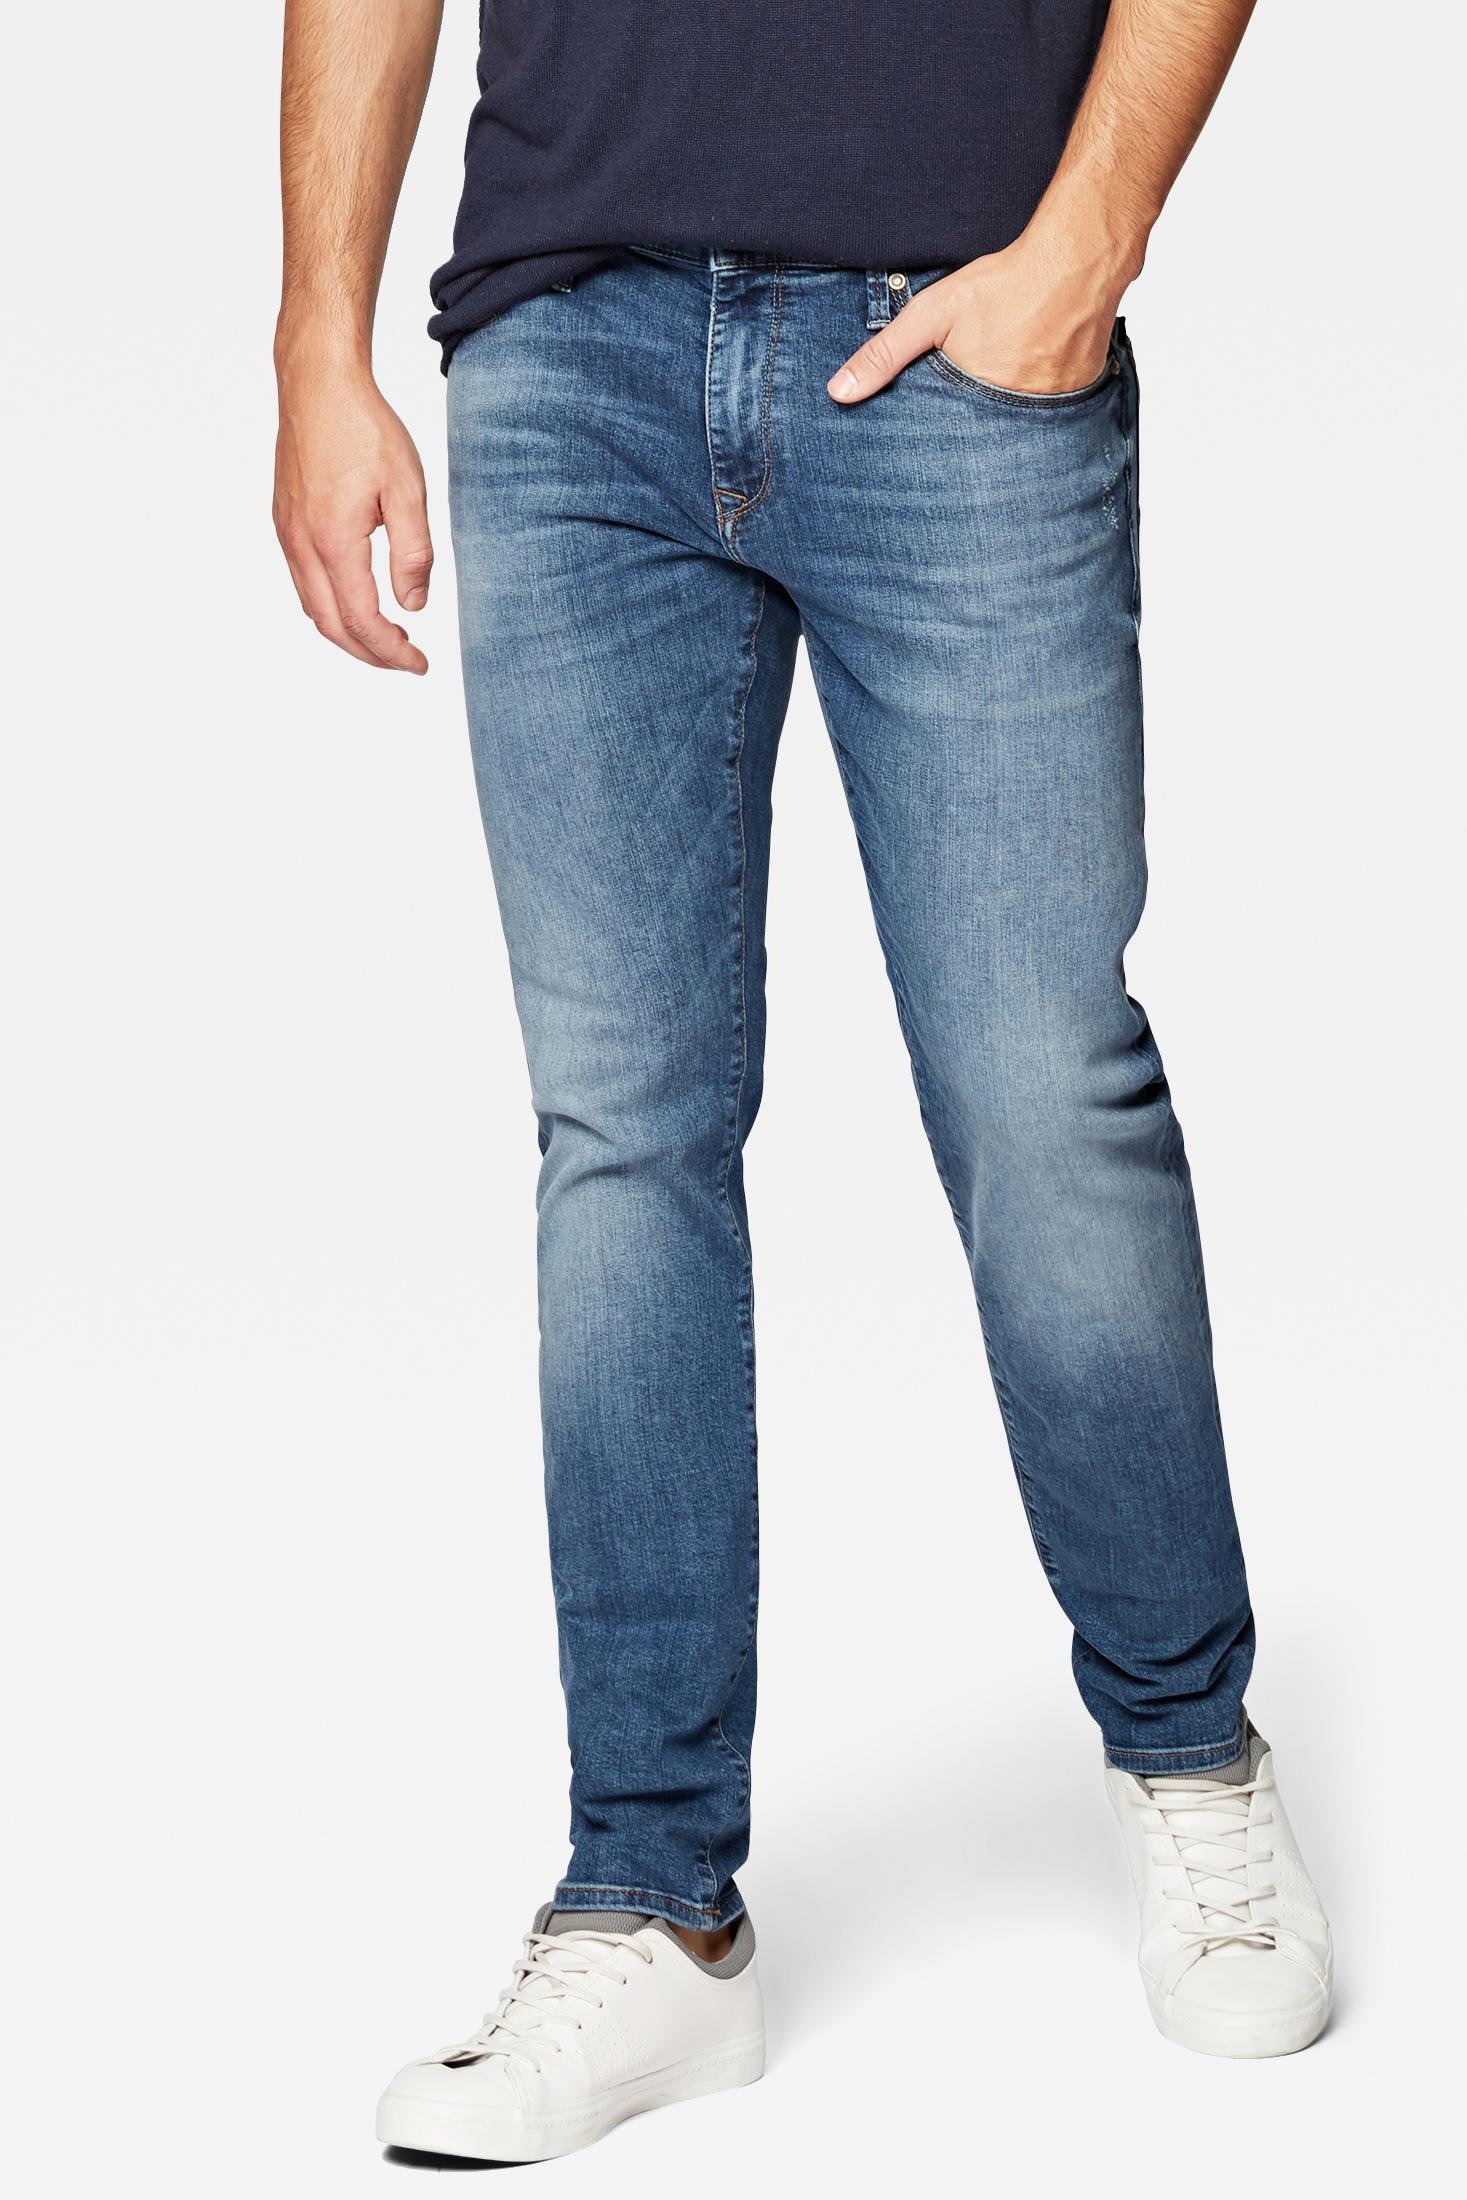 Mavi JAMES | Ultra Move – Skinny Jeans mid brushed